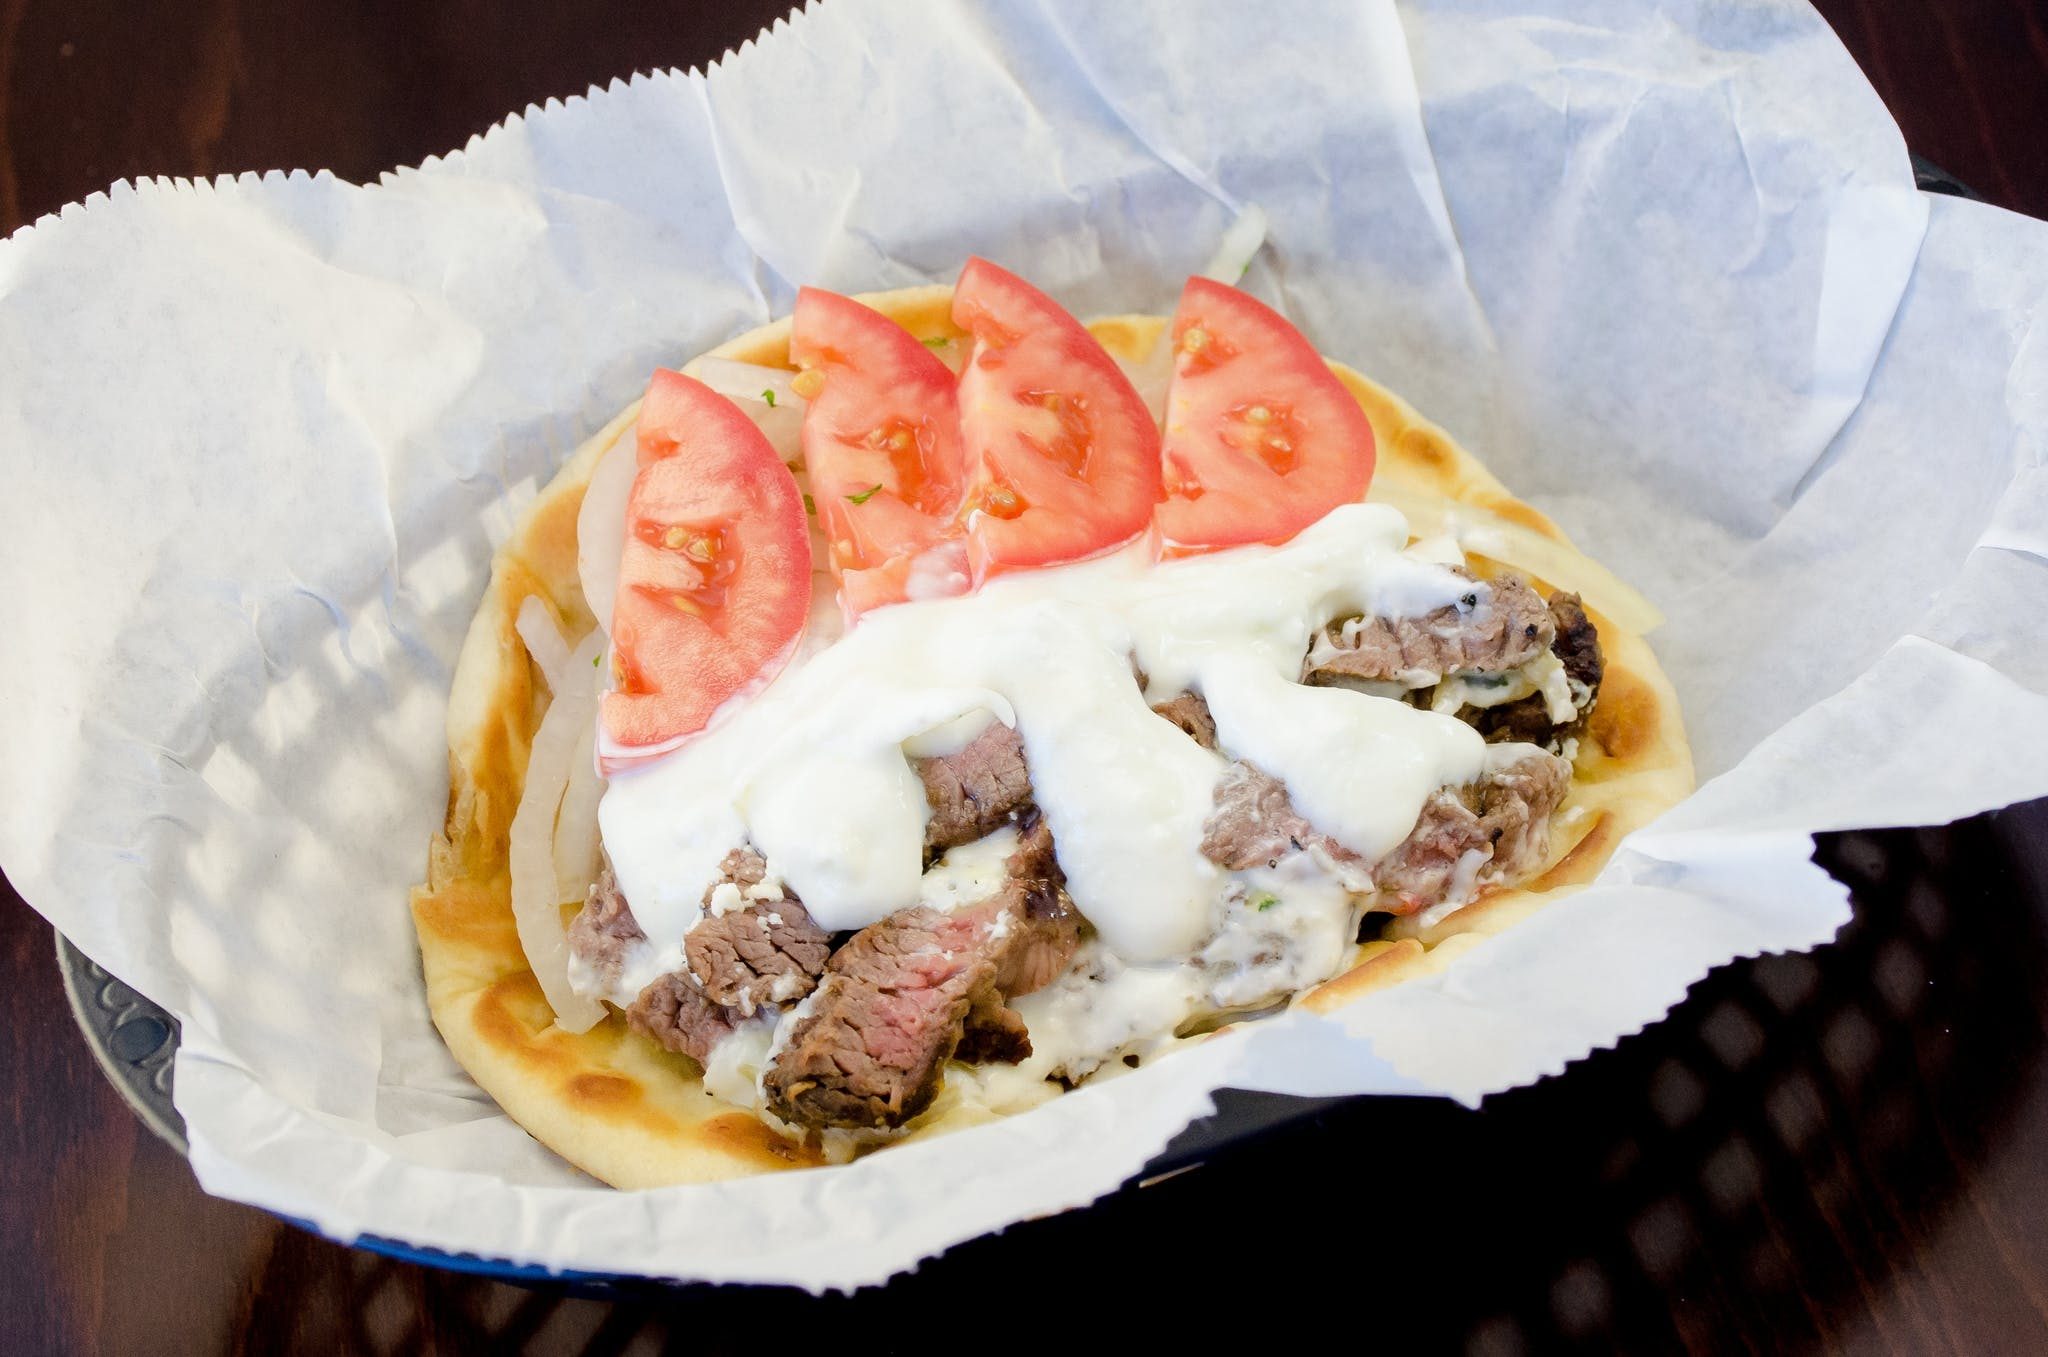 Grilled Steak Gyros Sandwich from Freska Mediterranean Grill in Middleton, WI